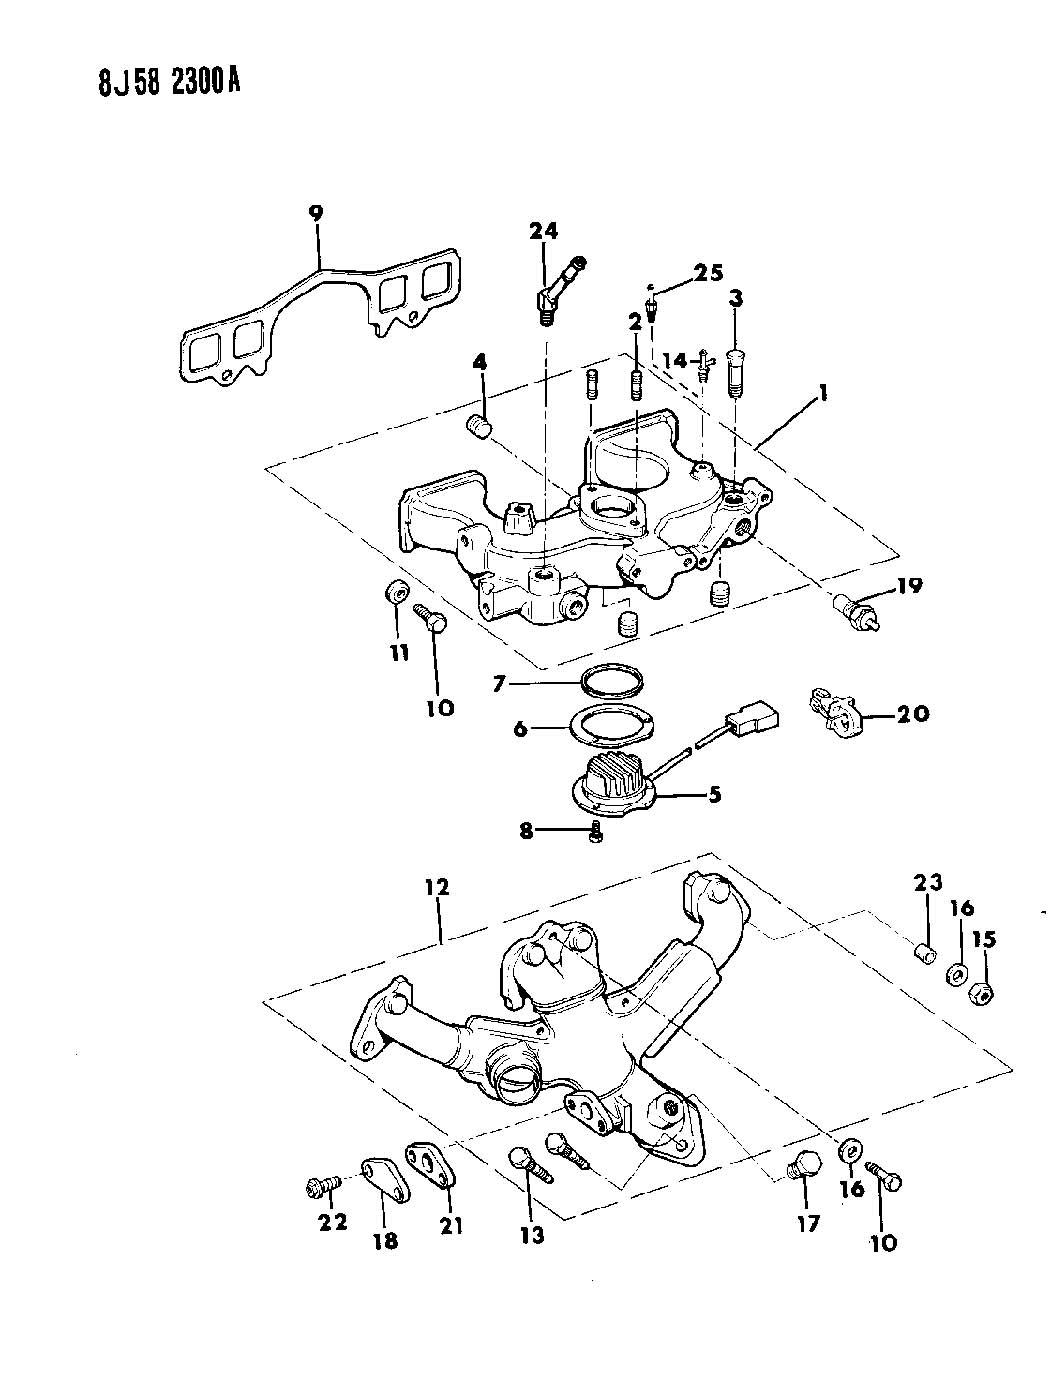 1988 Jeep Wrangler Manifold